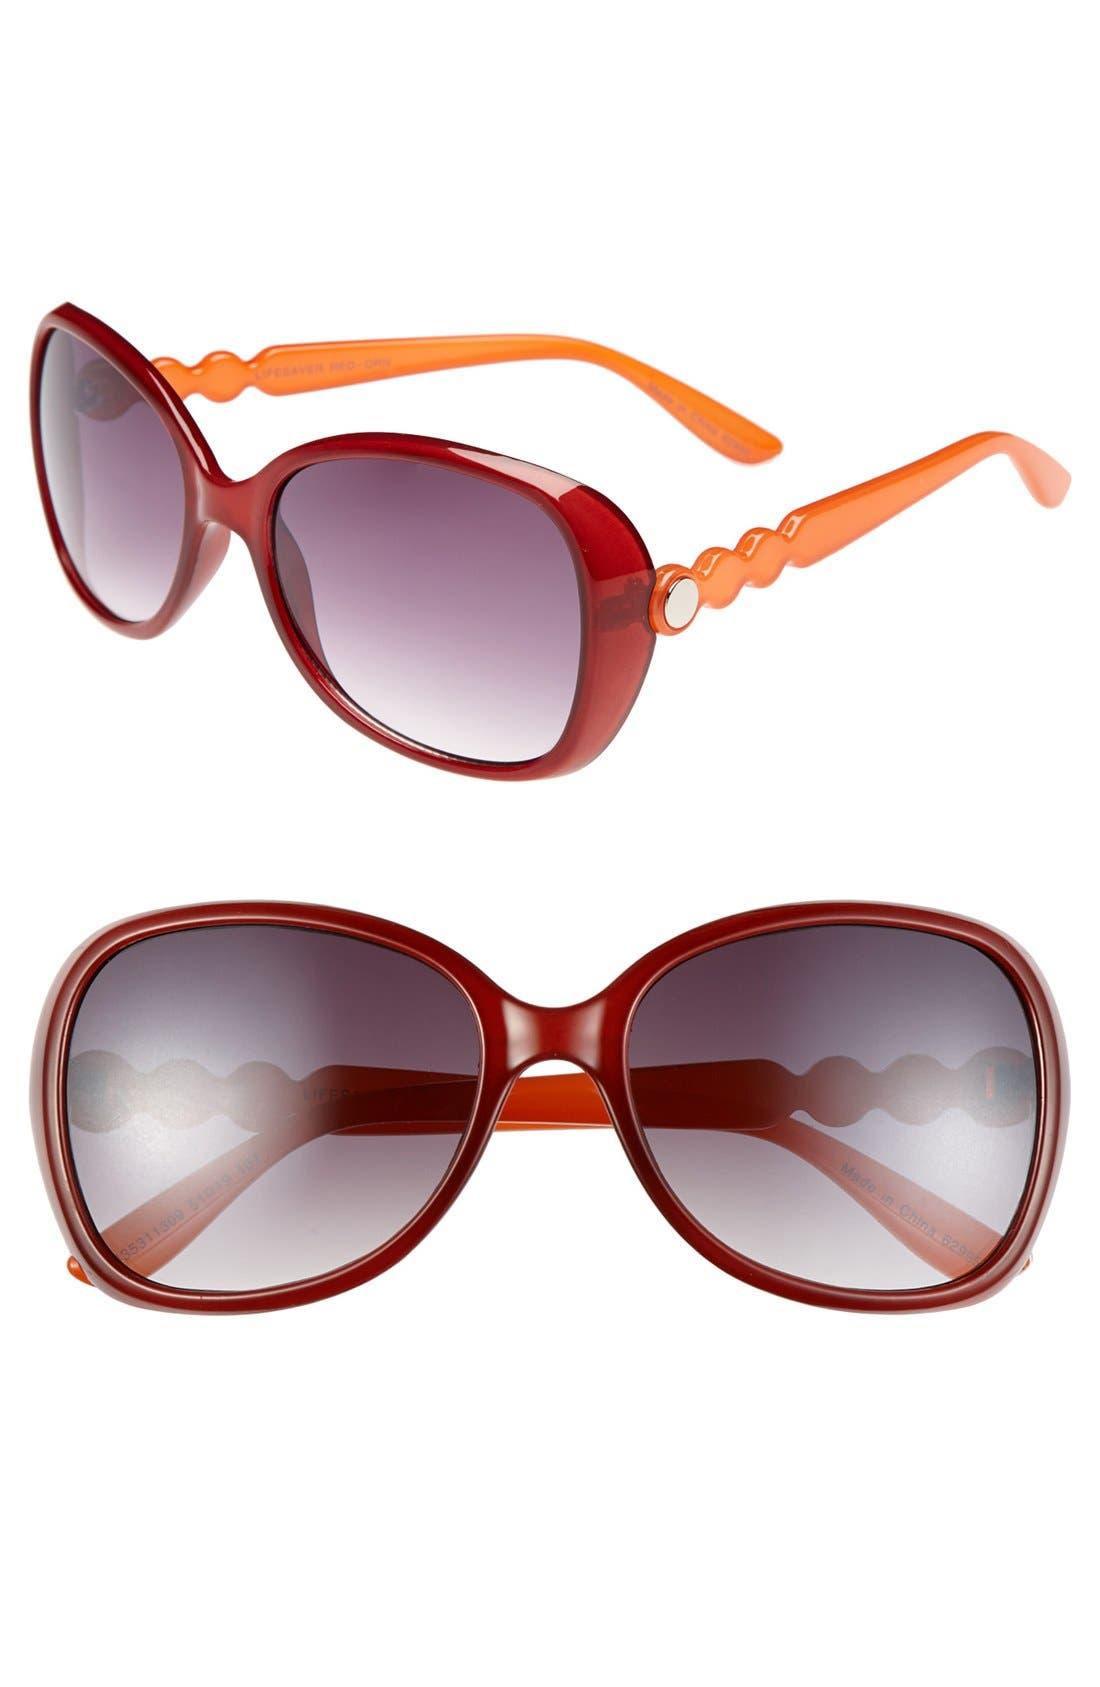 Alternate Image 1 Selected - Outlook Eyewear 'Lifesaver' 55mm Sunglasses